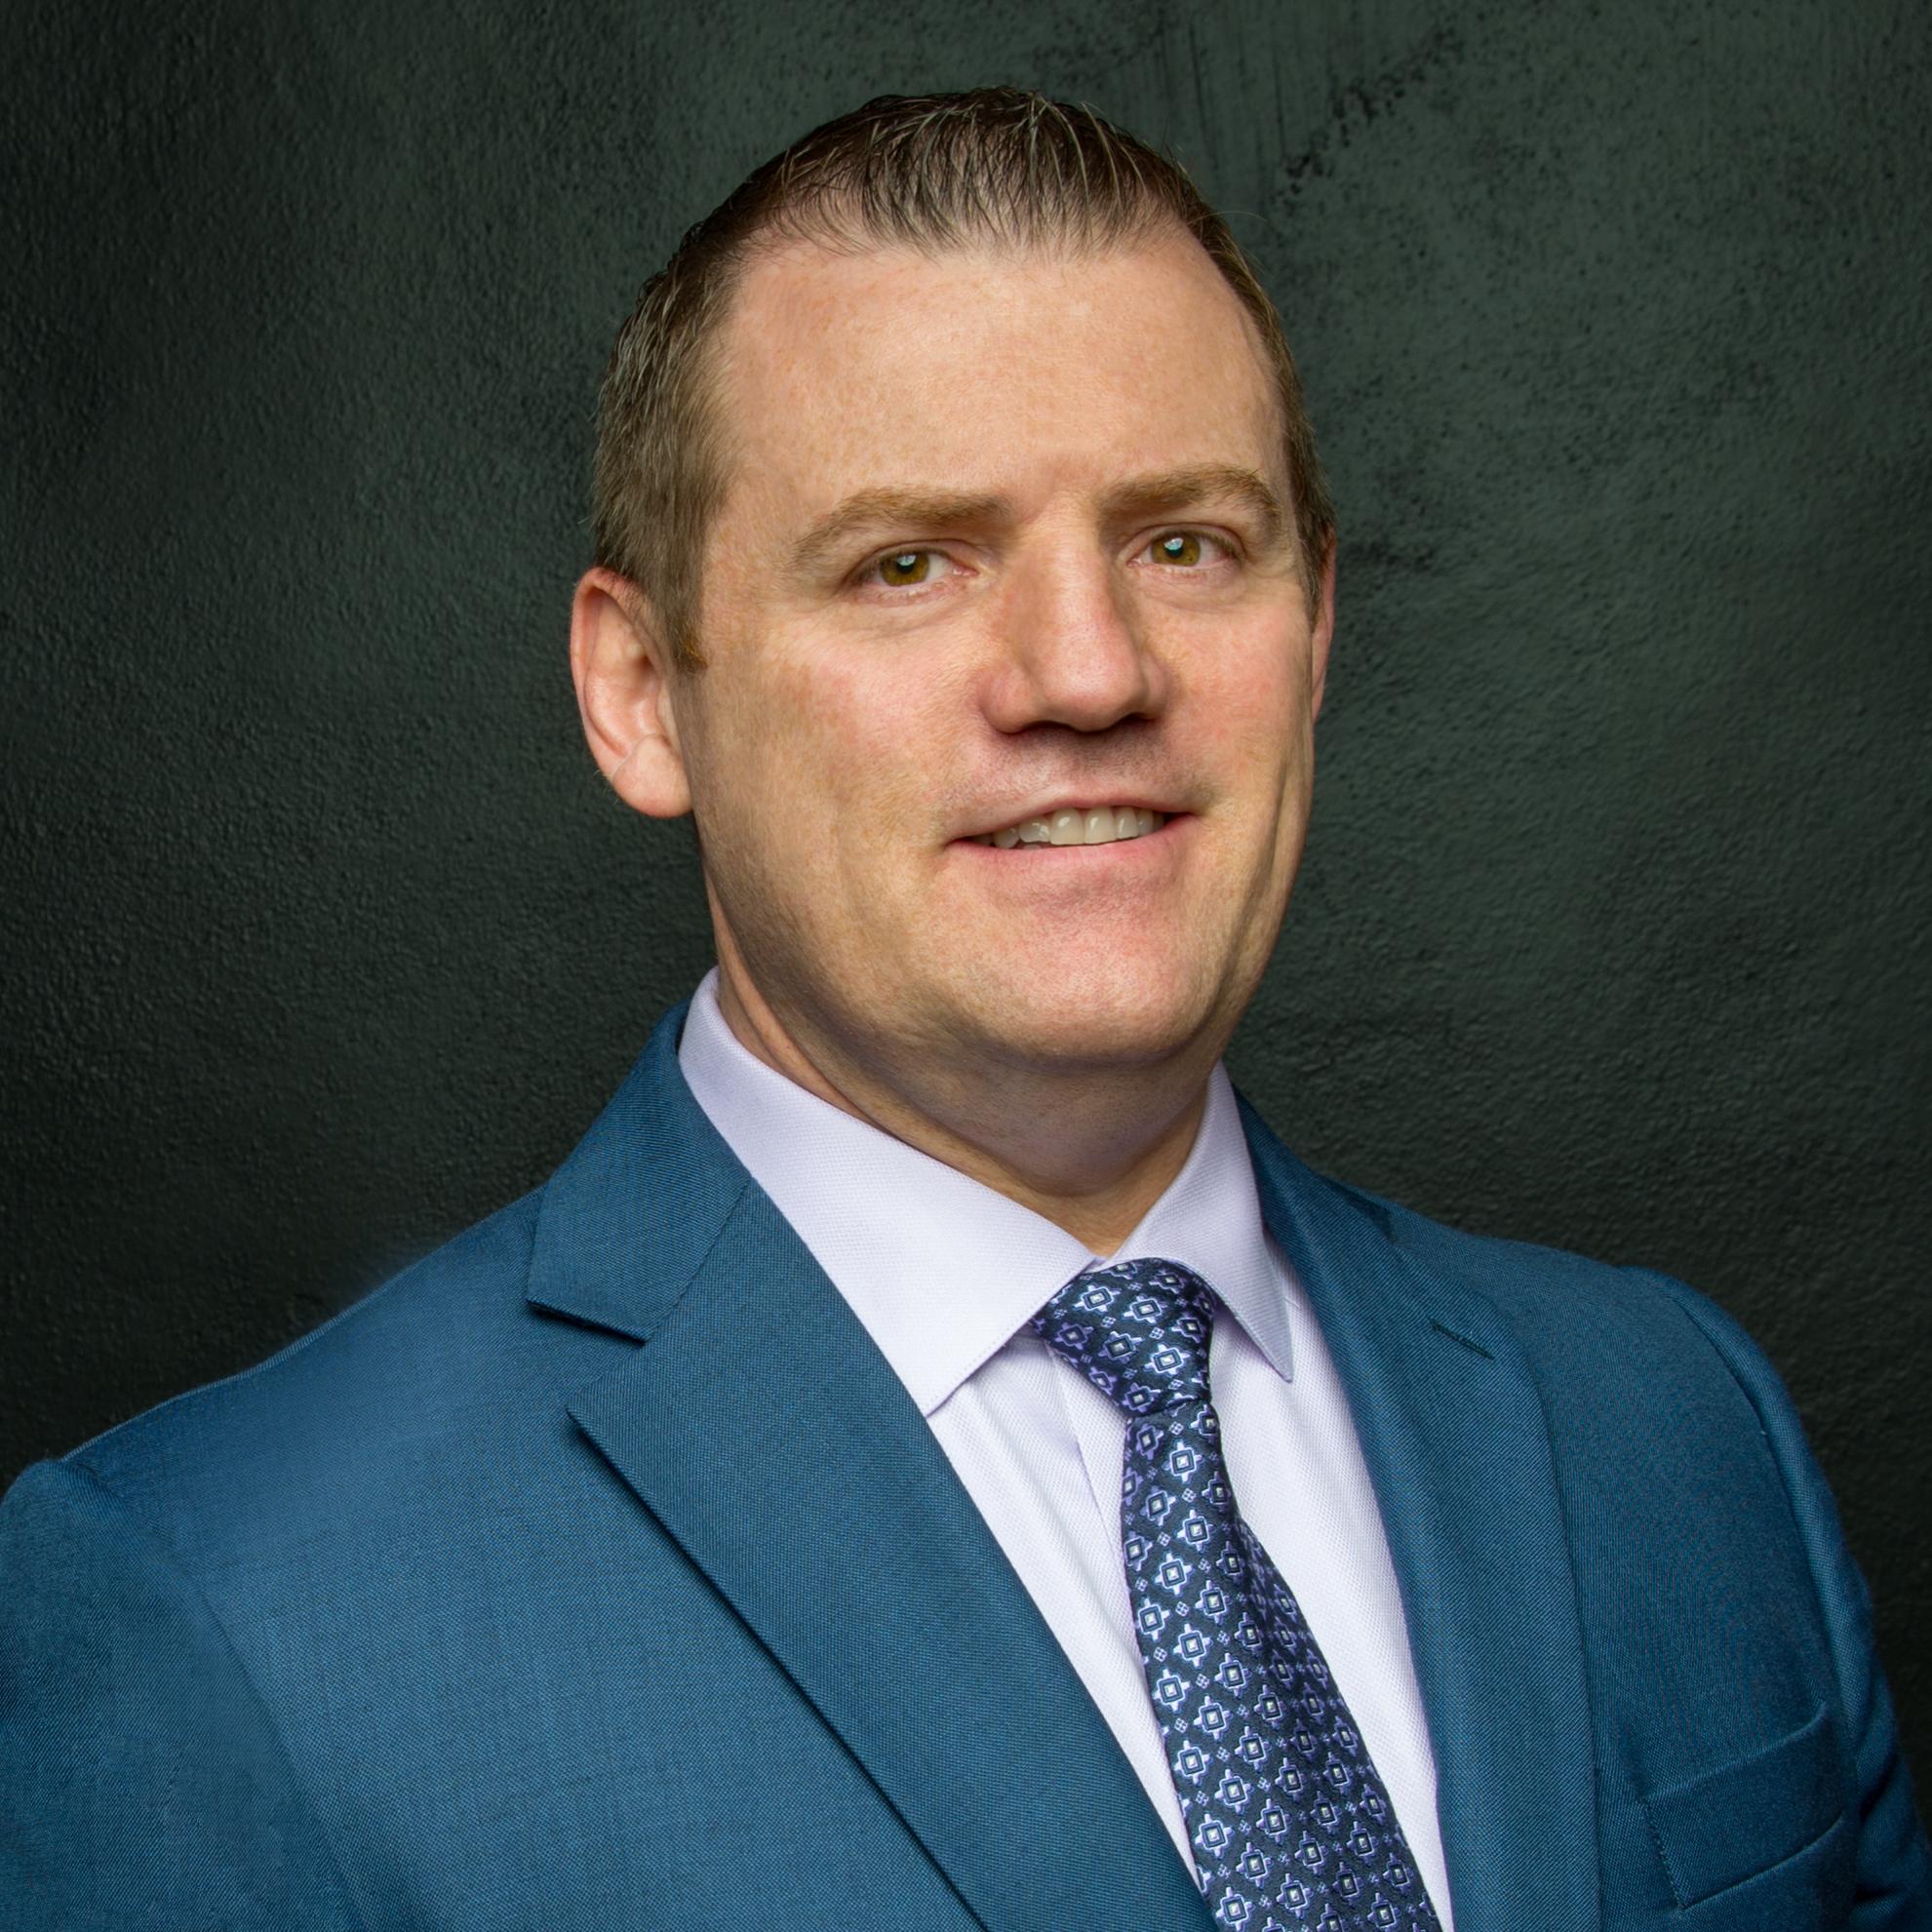 Mark Huse - Vice President of Casino Operations, Harrah's New Orleans Casino & Hotel